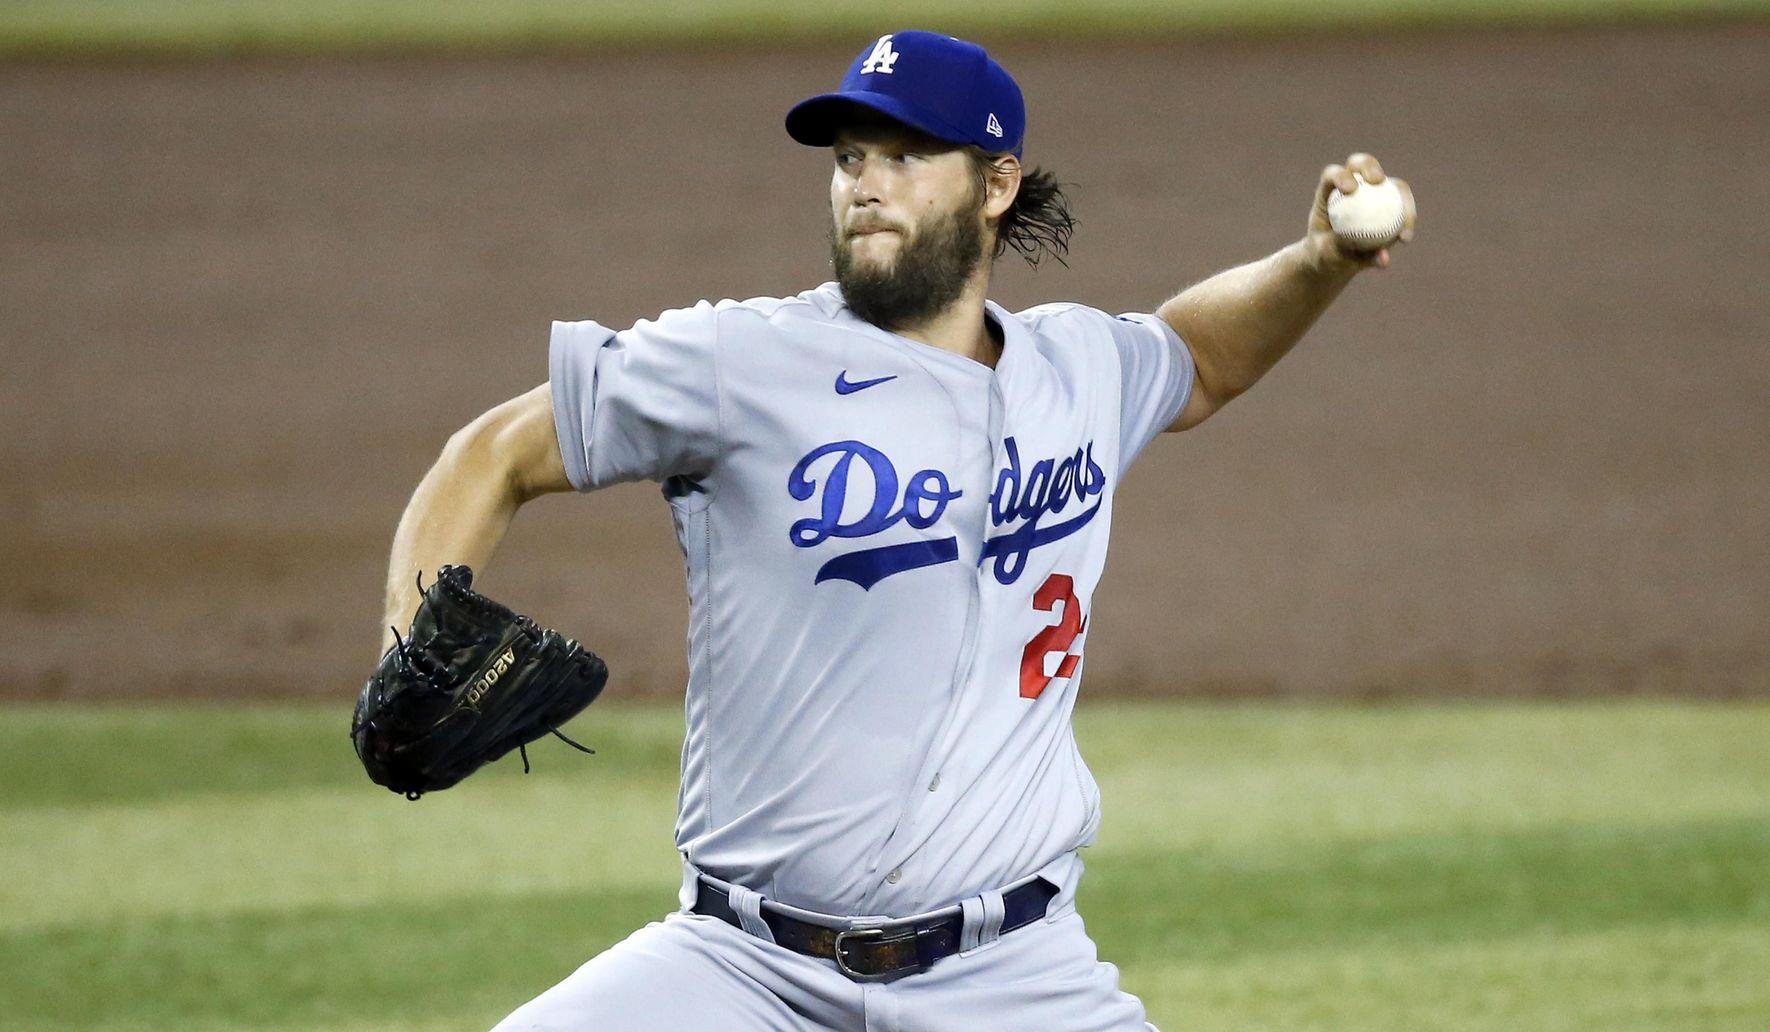 Dodgers_diamondbacks_baseball_64028_c0-151-3600-2249_s1770x1032